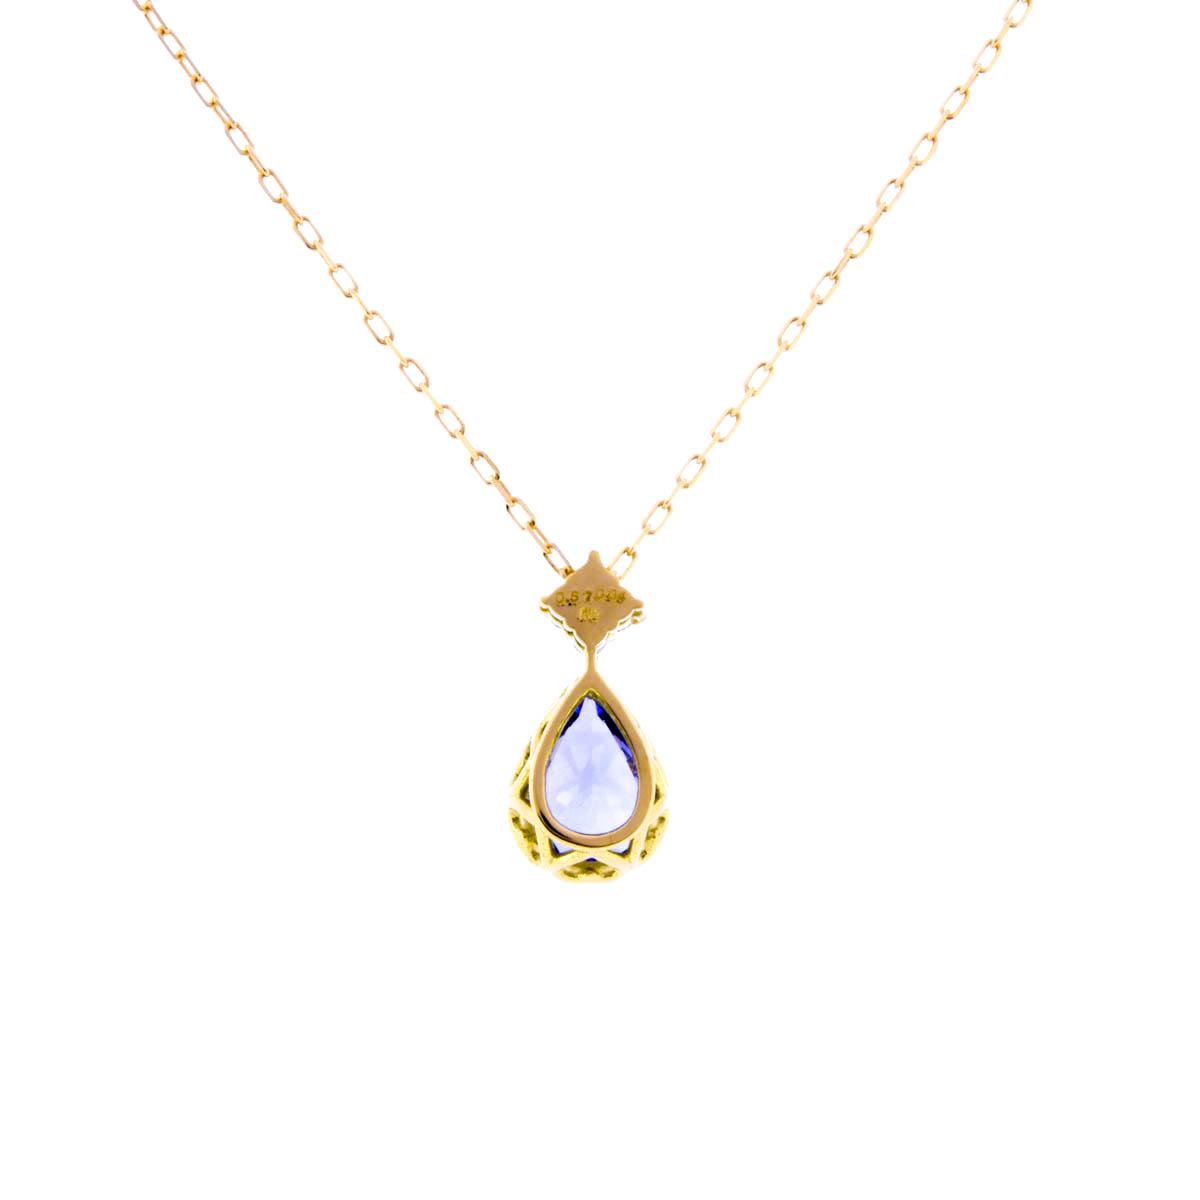 K18YG タンザナイト ペンダント ネックレス ひし形 ダイヤバチカン付き ペアシェイプ